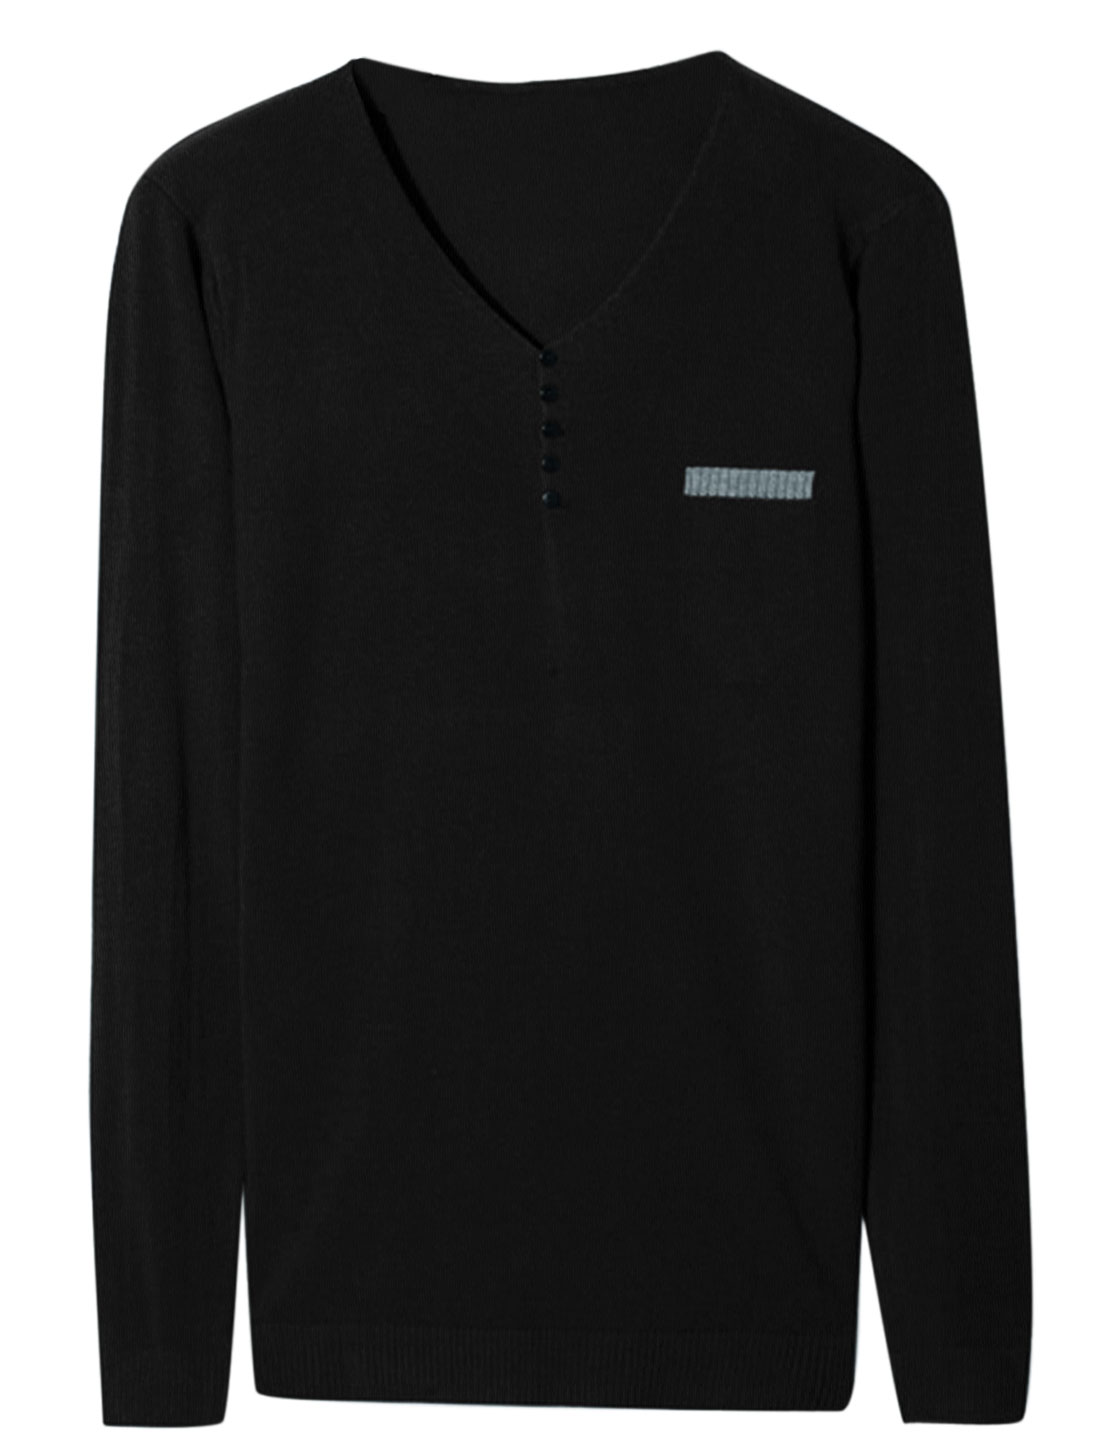 Men V Neck Long Sleeve Buttons Decor Stylish Knit Shirt Black M